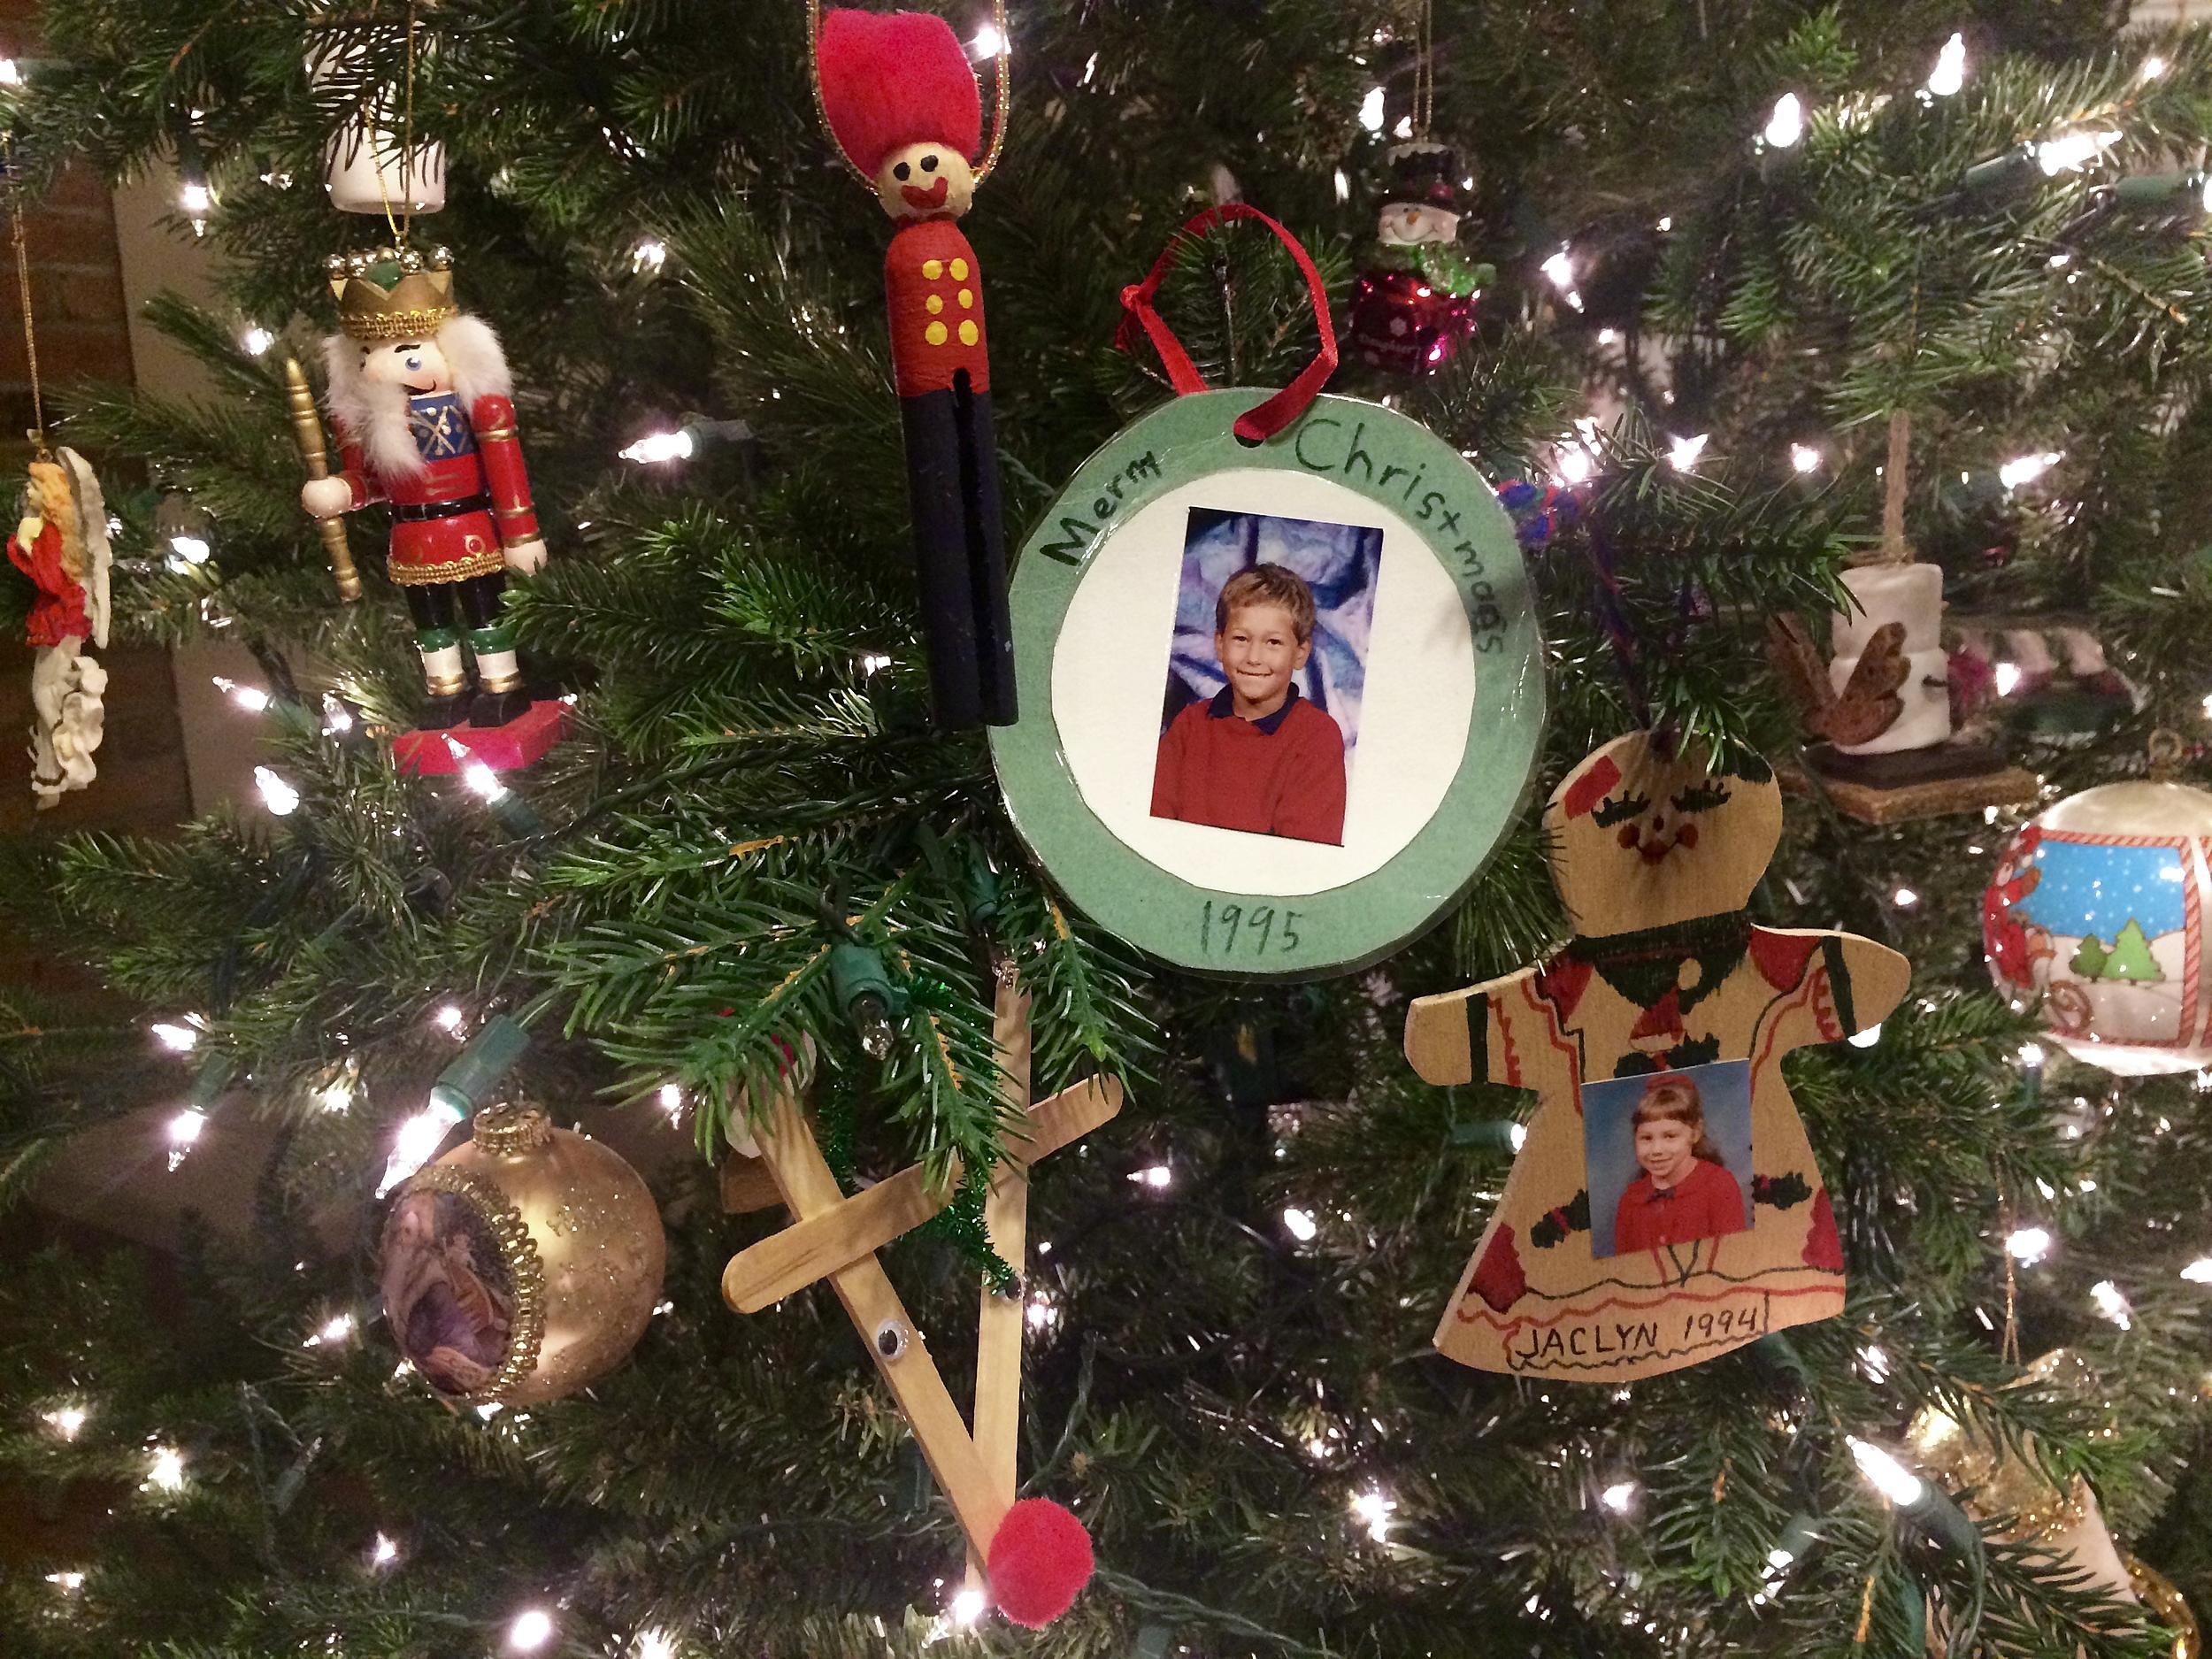 Deb's family Christmas tree; credit by Deb Turner